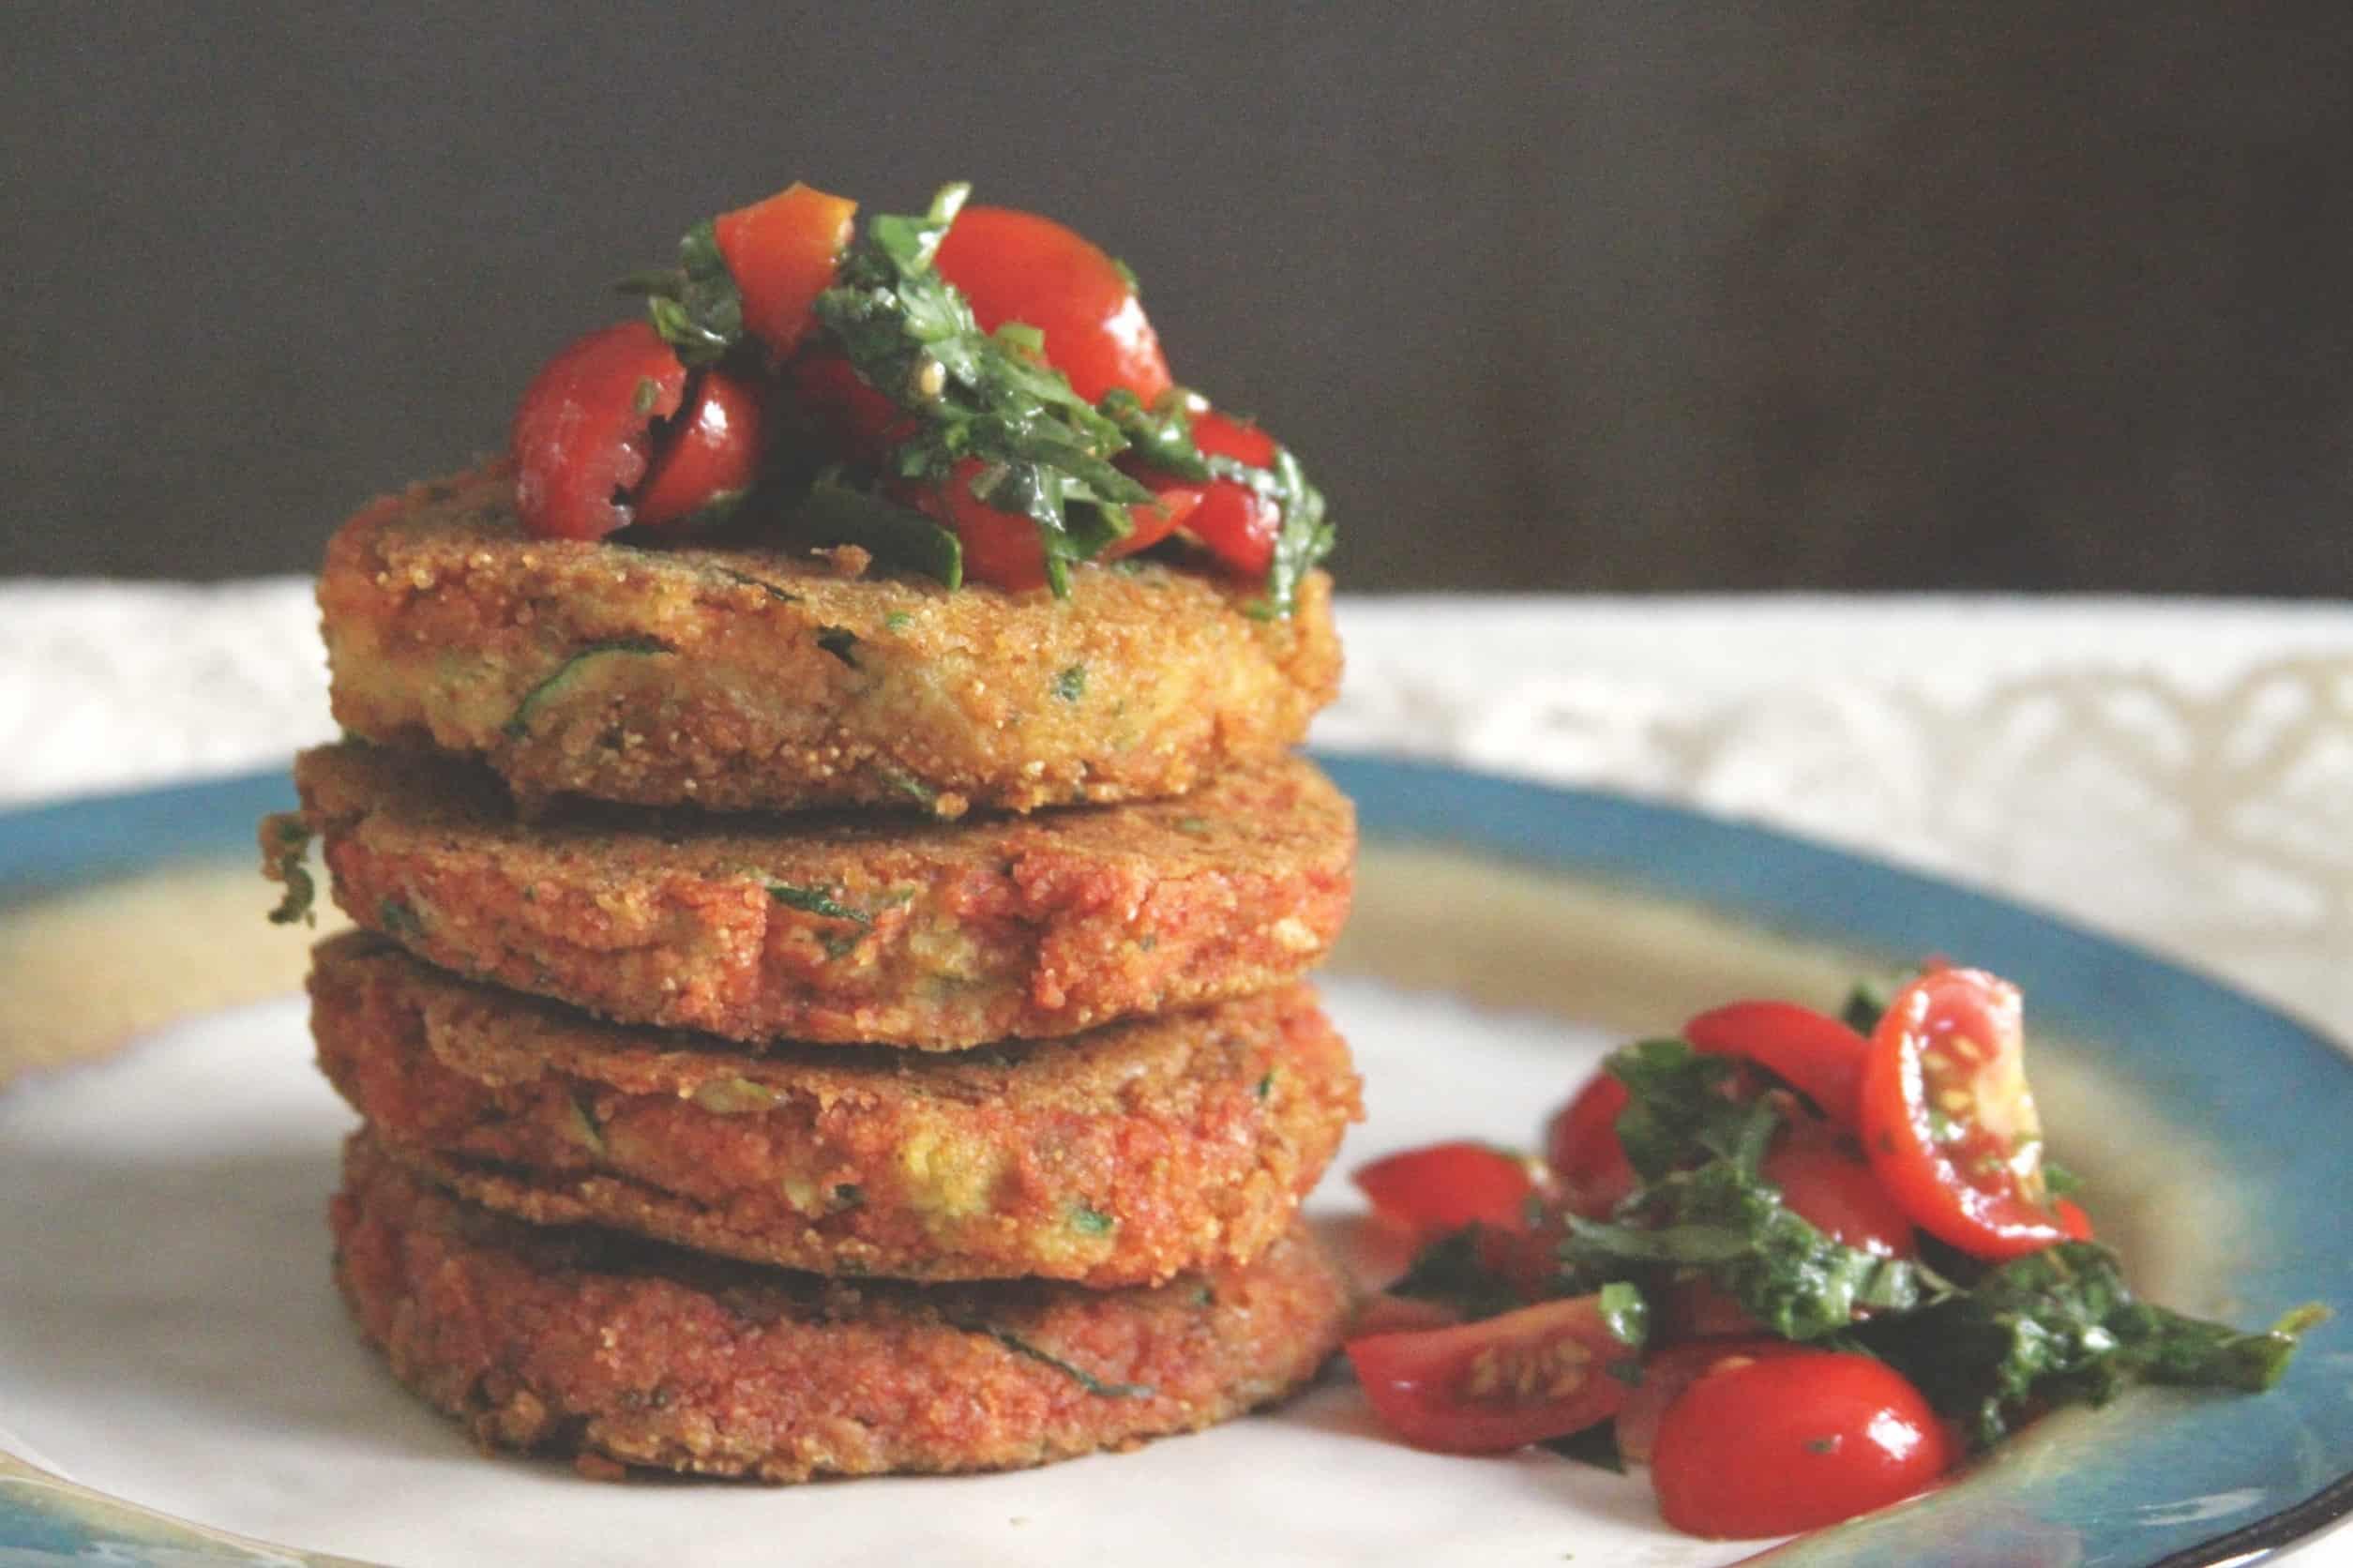 Vegan Cornmeal Zucchini Pancakes